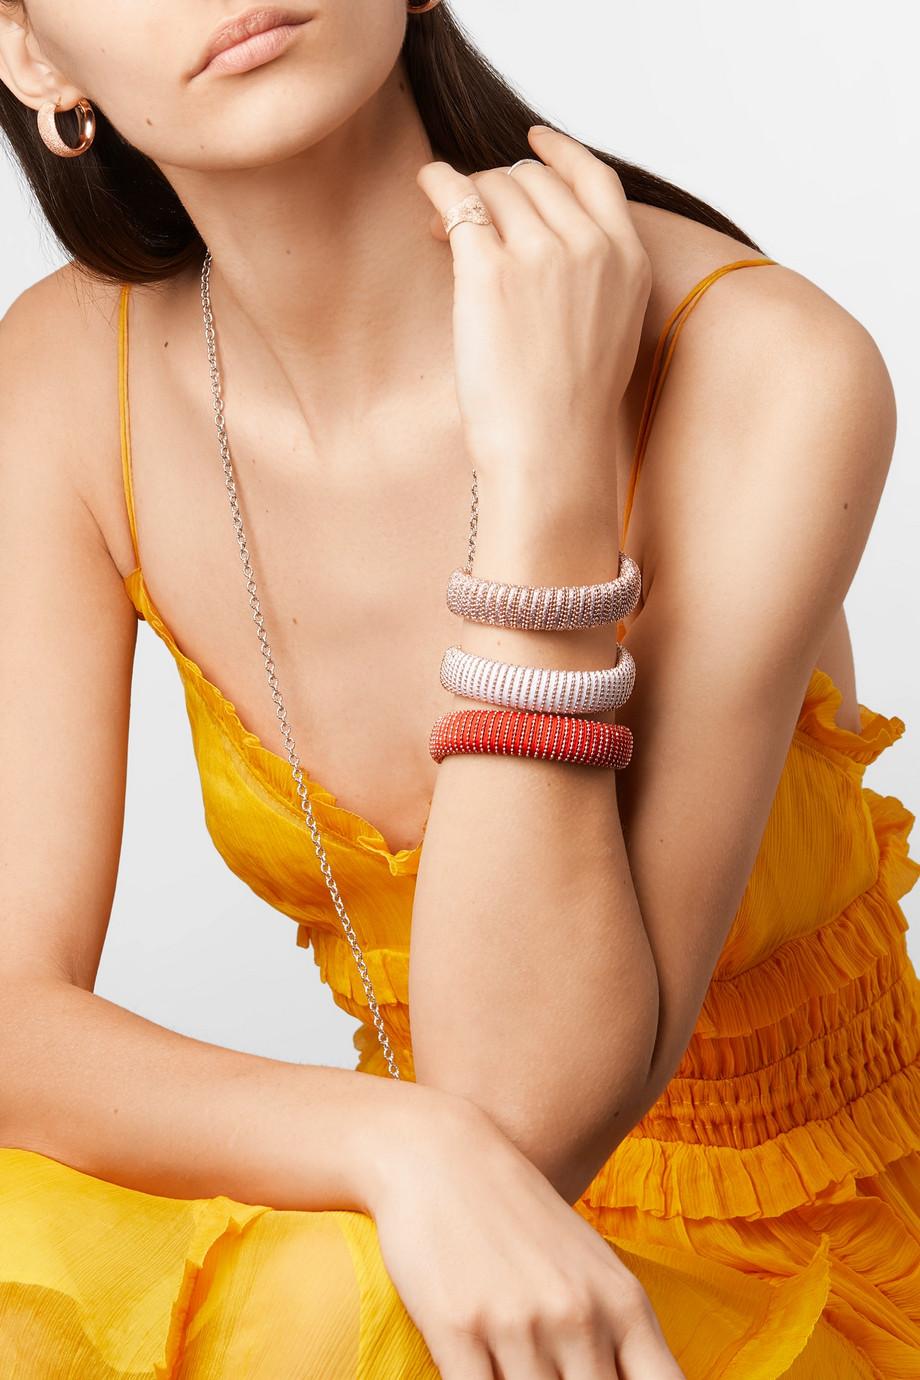 Carolina Bucci Caro set of three 18-karat rose gold-plated, cotton and Lurex bracelets